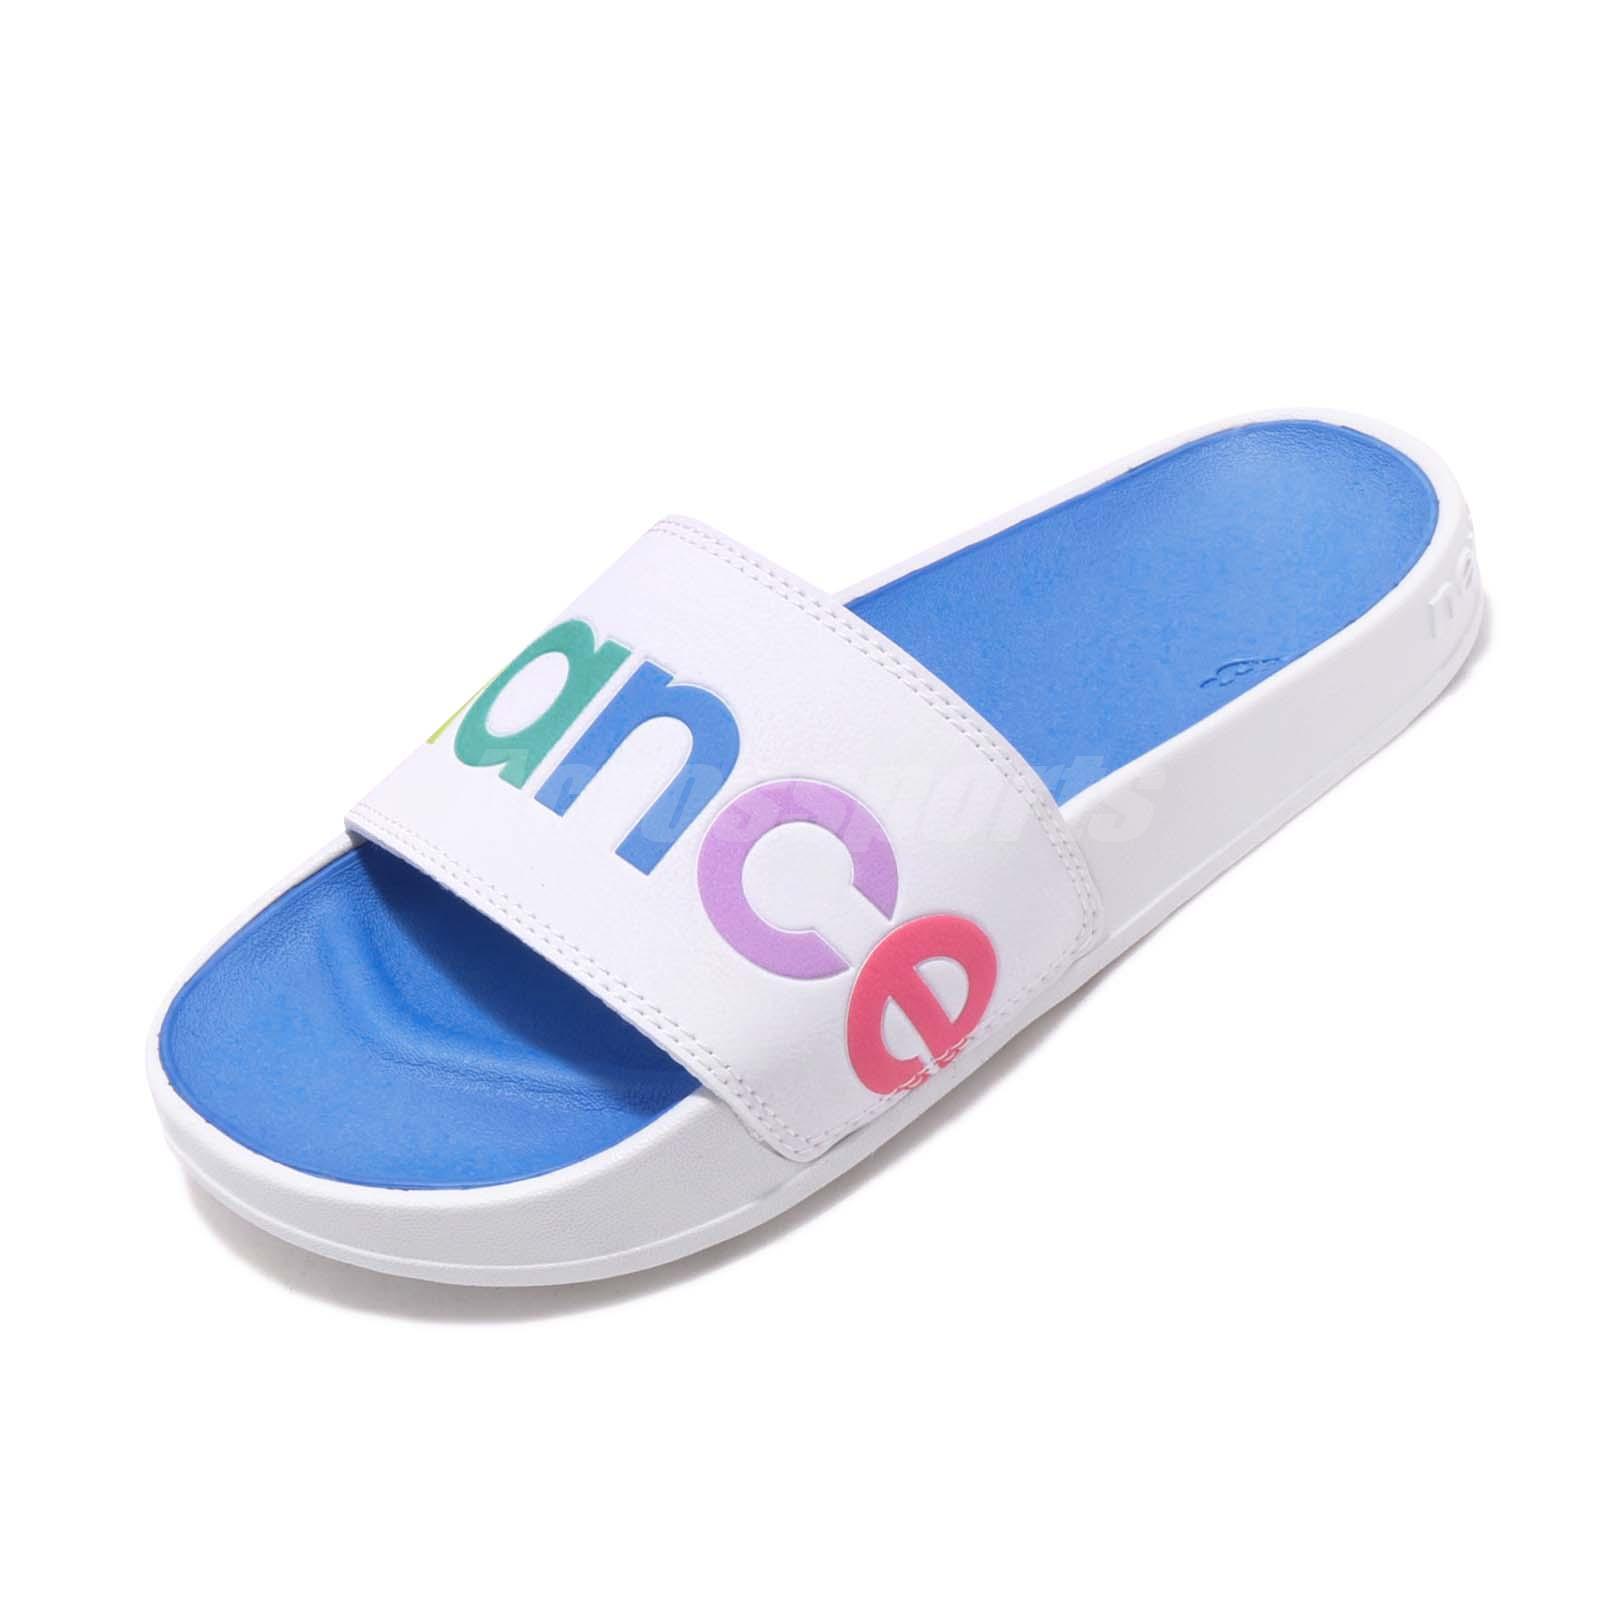 SWF200A1 New Balance Women/'s Sports Slide Sandal Blue-White Sliders />2-DAY SHIP